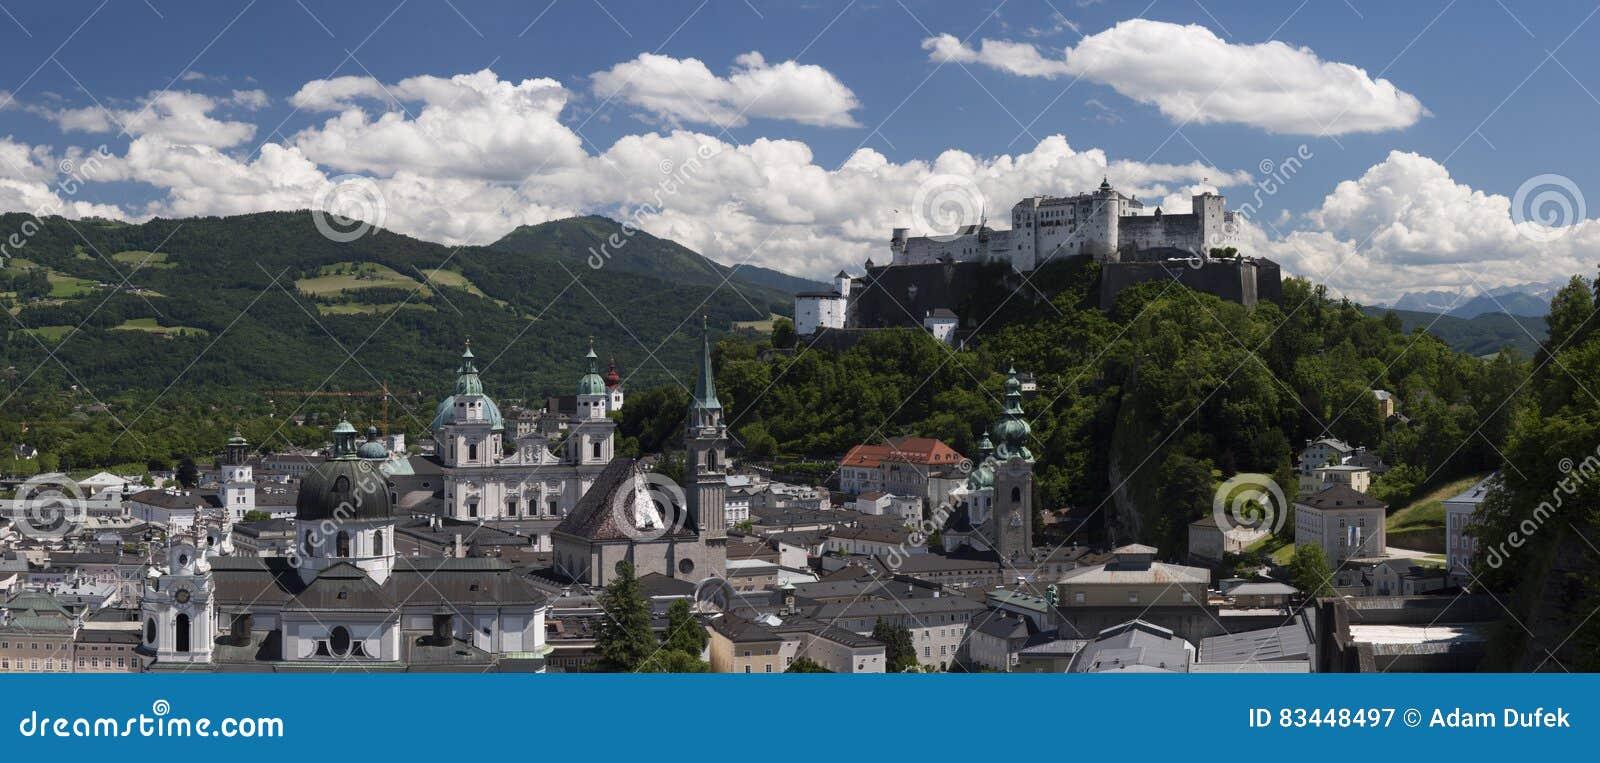 Bella vista di Salisburgo con Festung Hohensalzburg